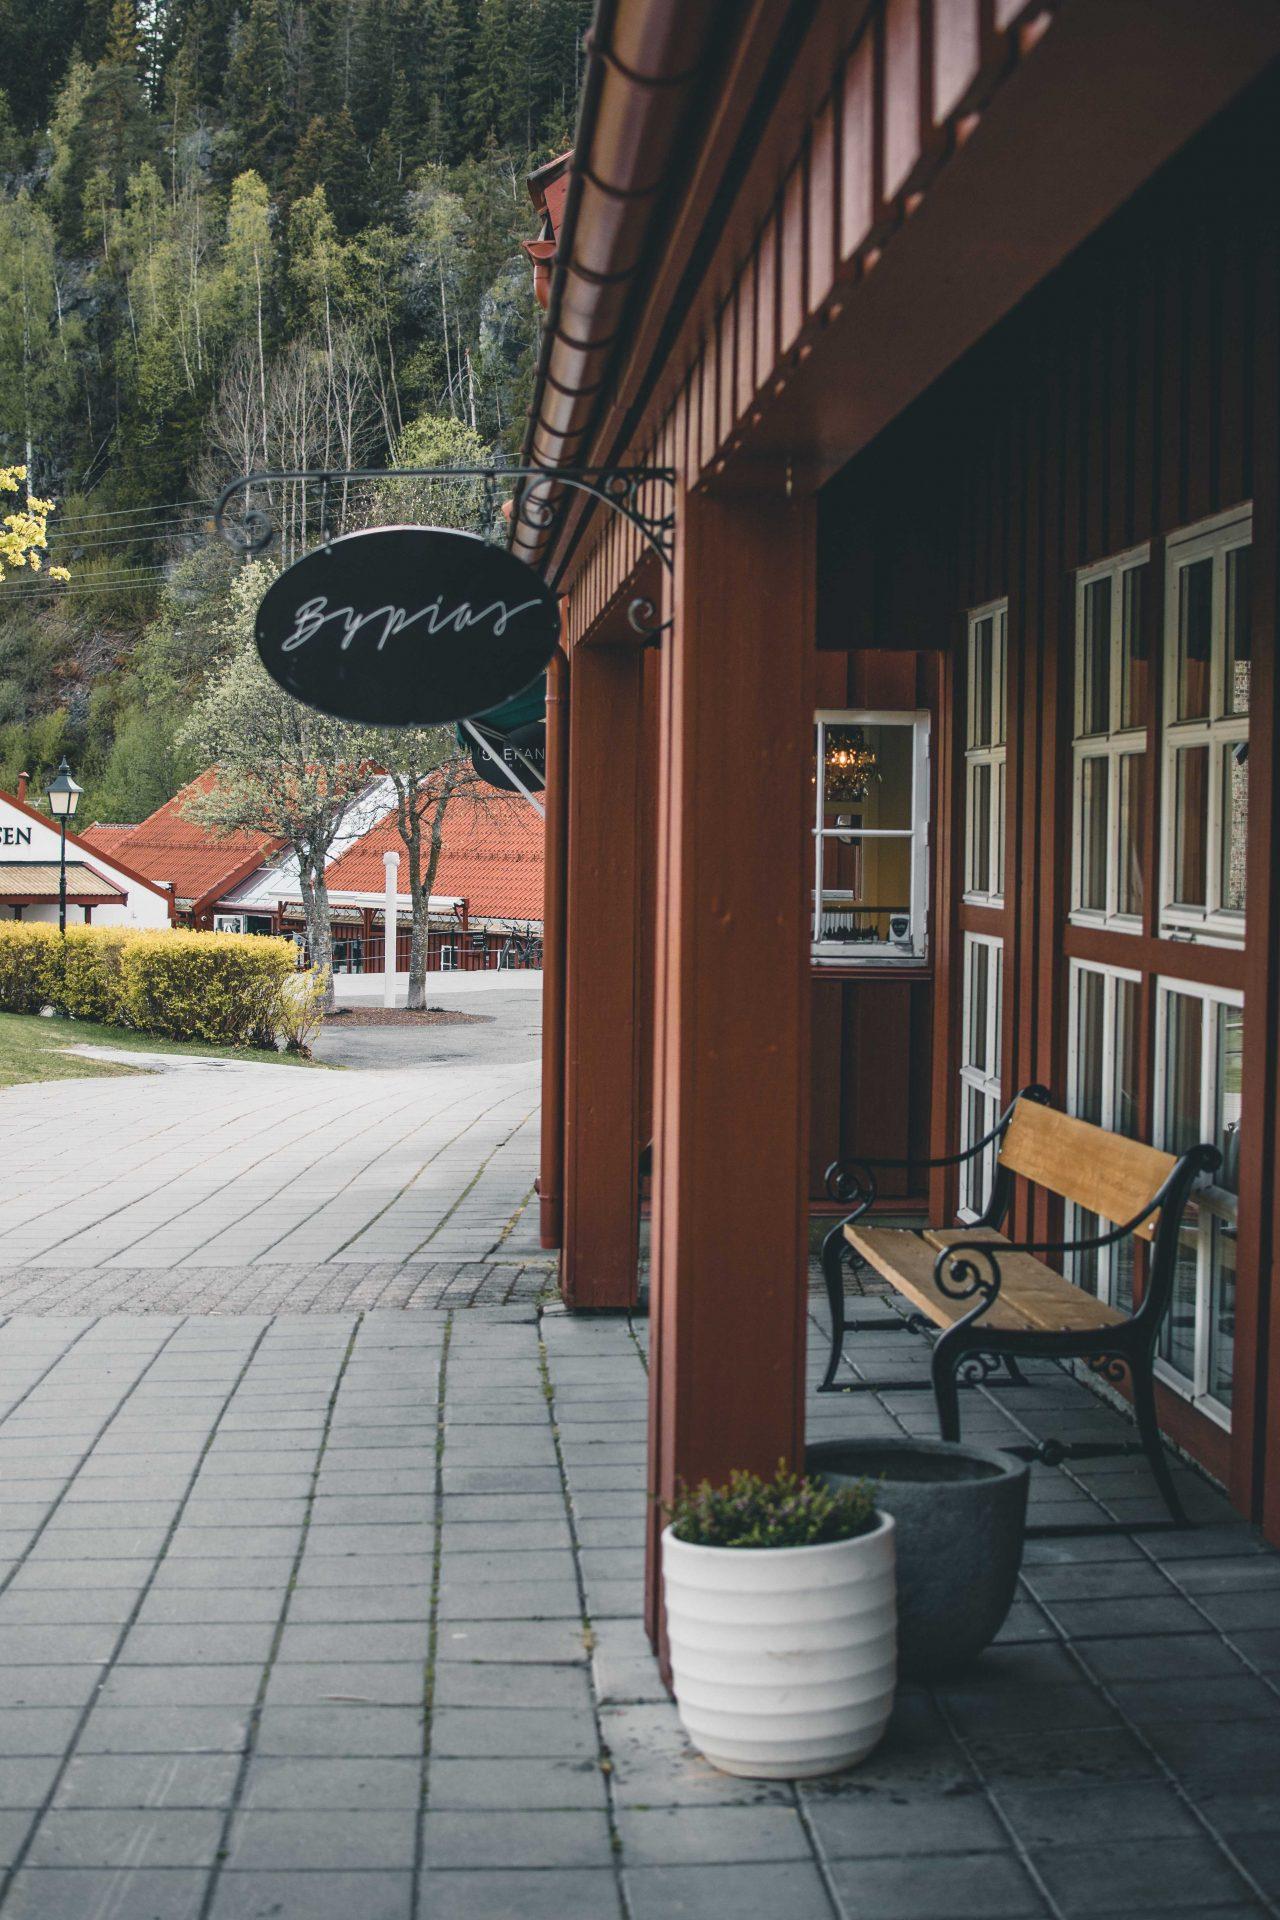 baerums verk norwegia